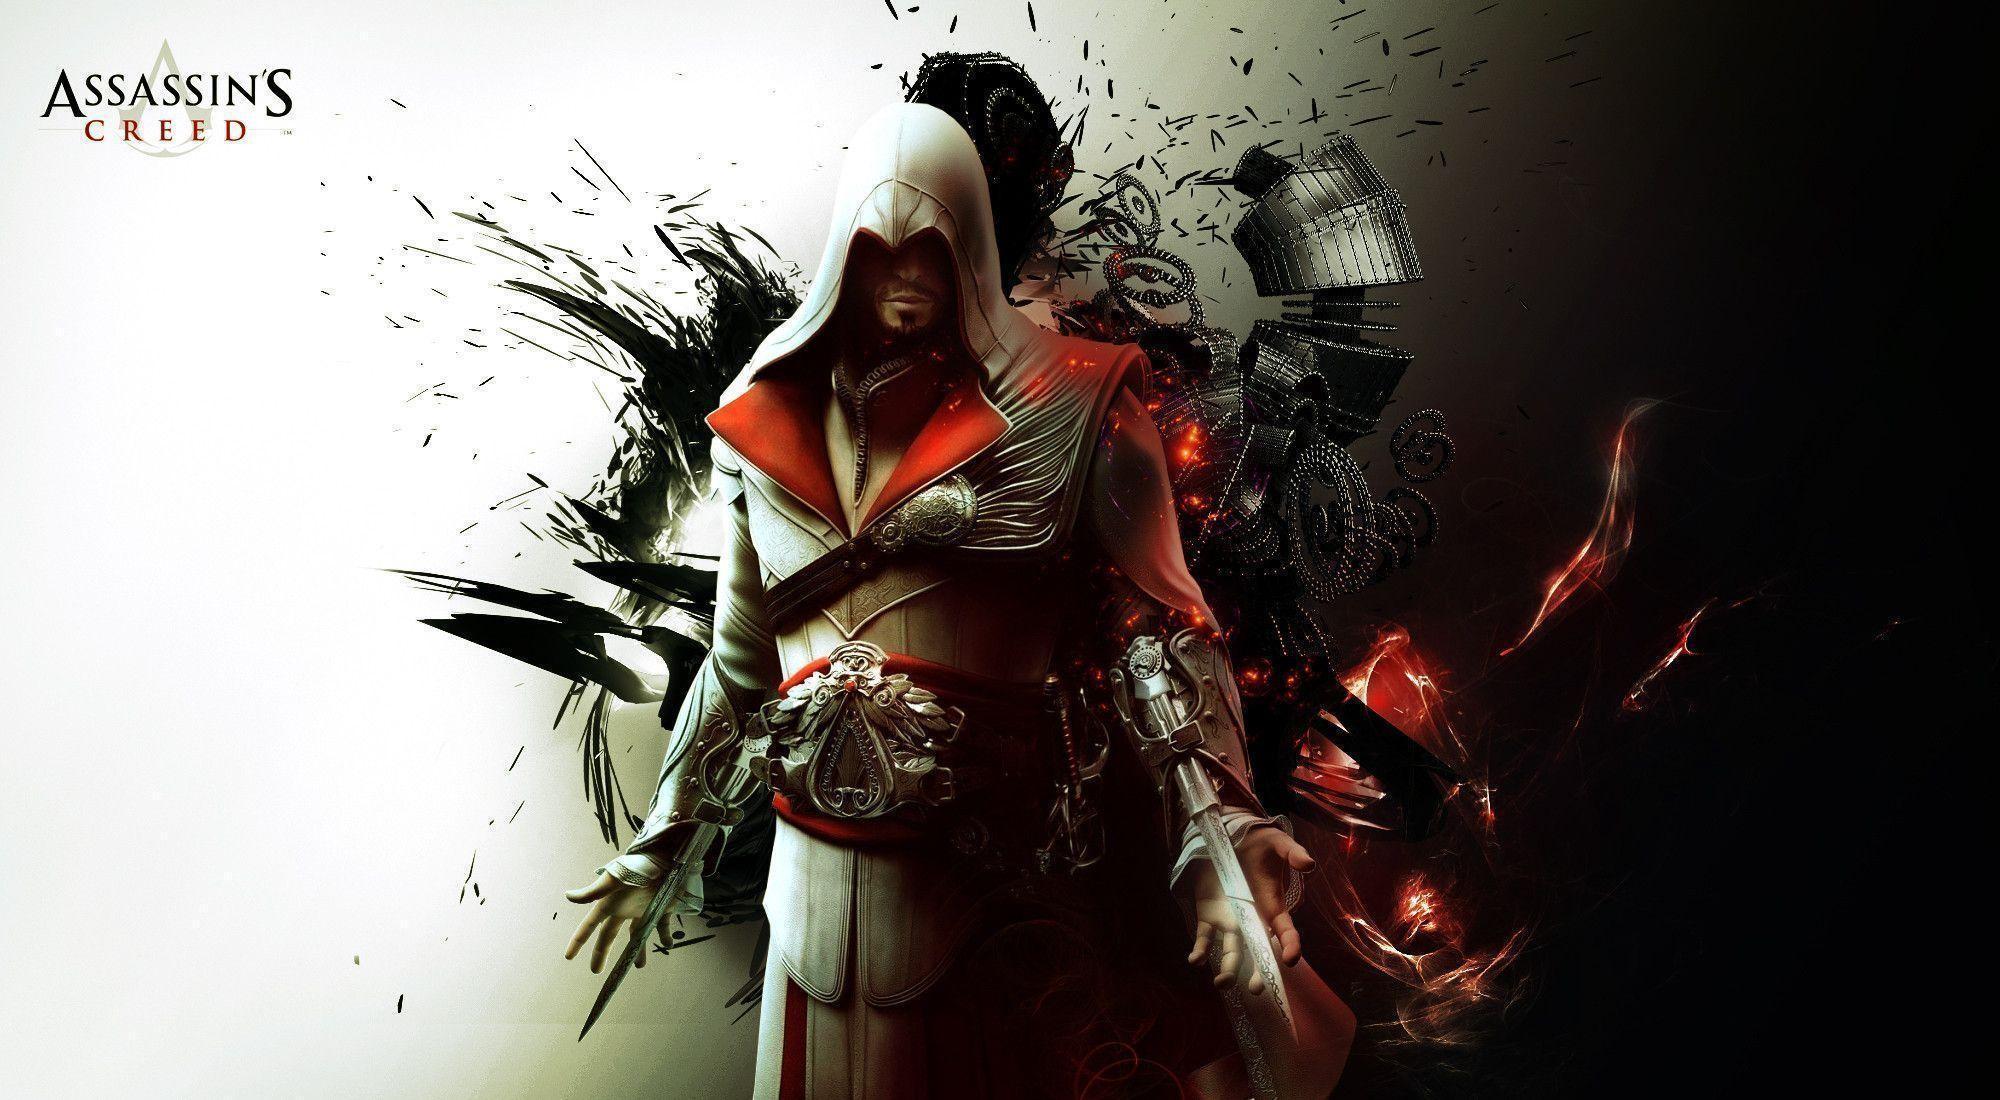 Assassin Creed Brotherhood Game Wallpaper second series Album List